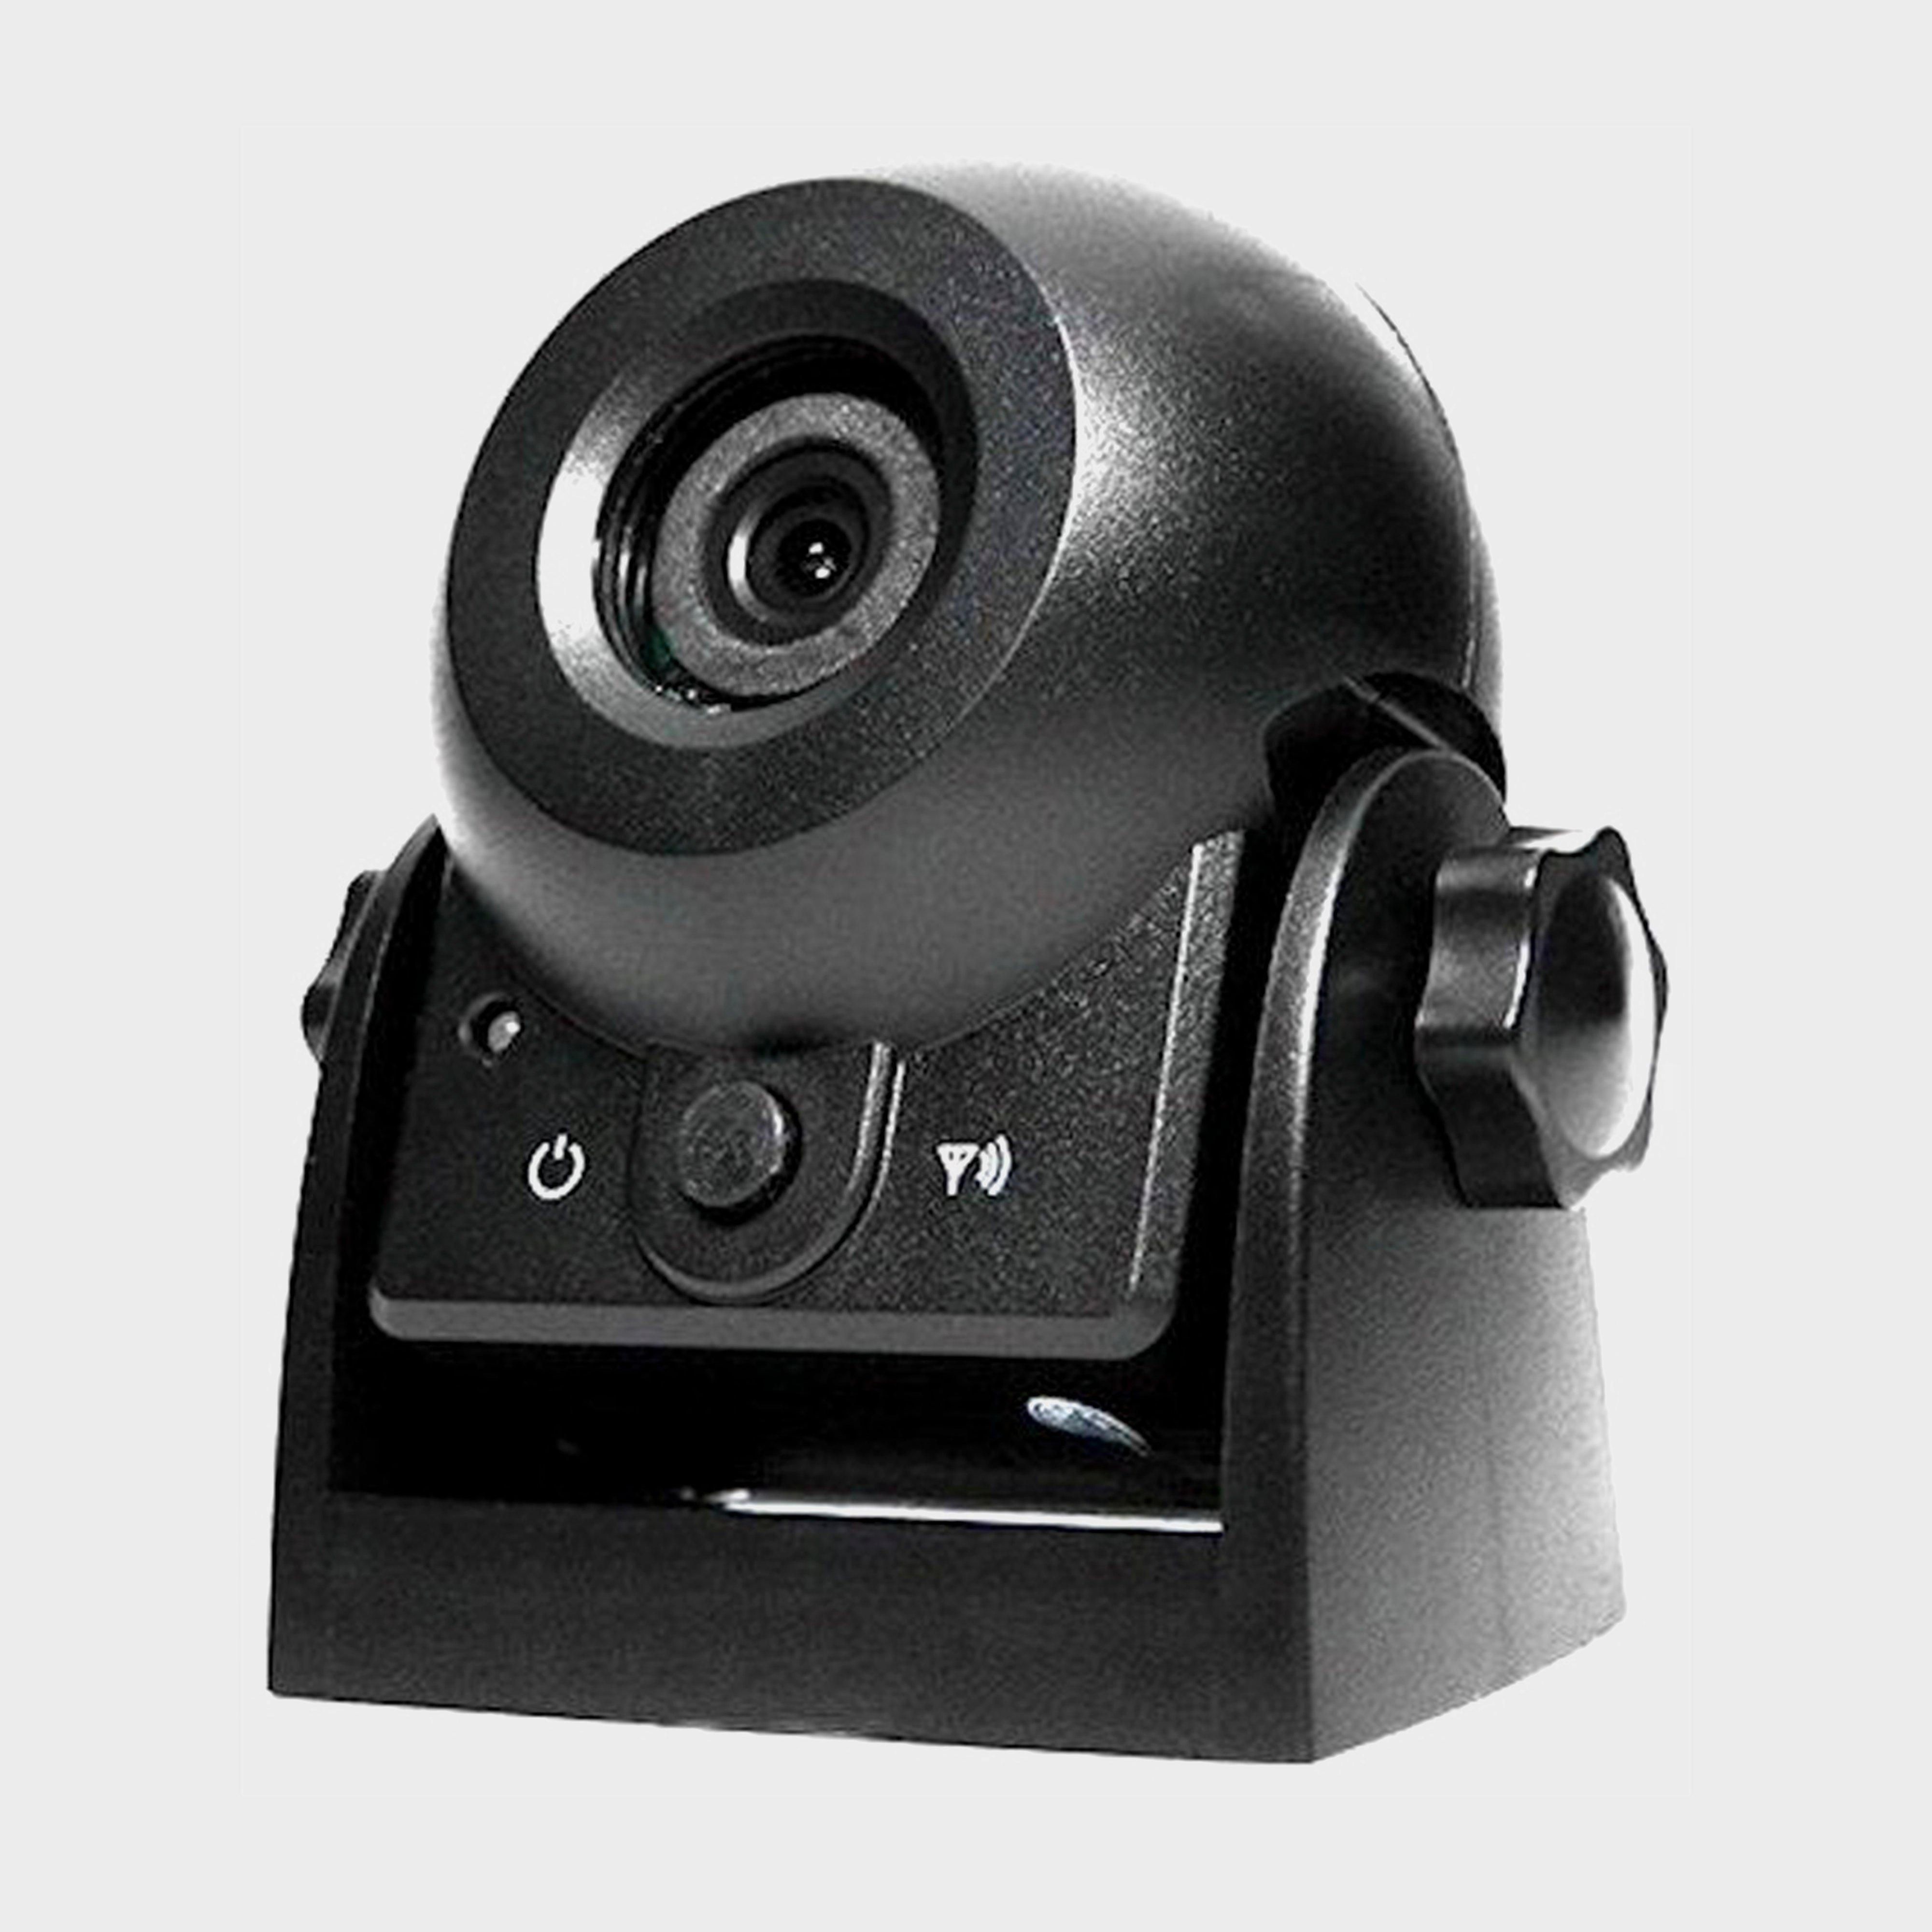 Falcon Wi-Fi Wireless Rear View Reversing Camera, NOCOLOUR/CAMERA